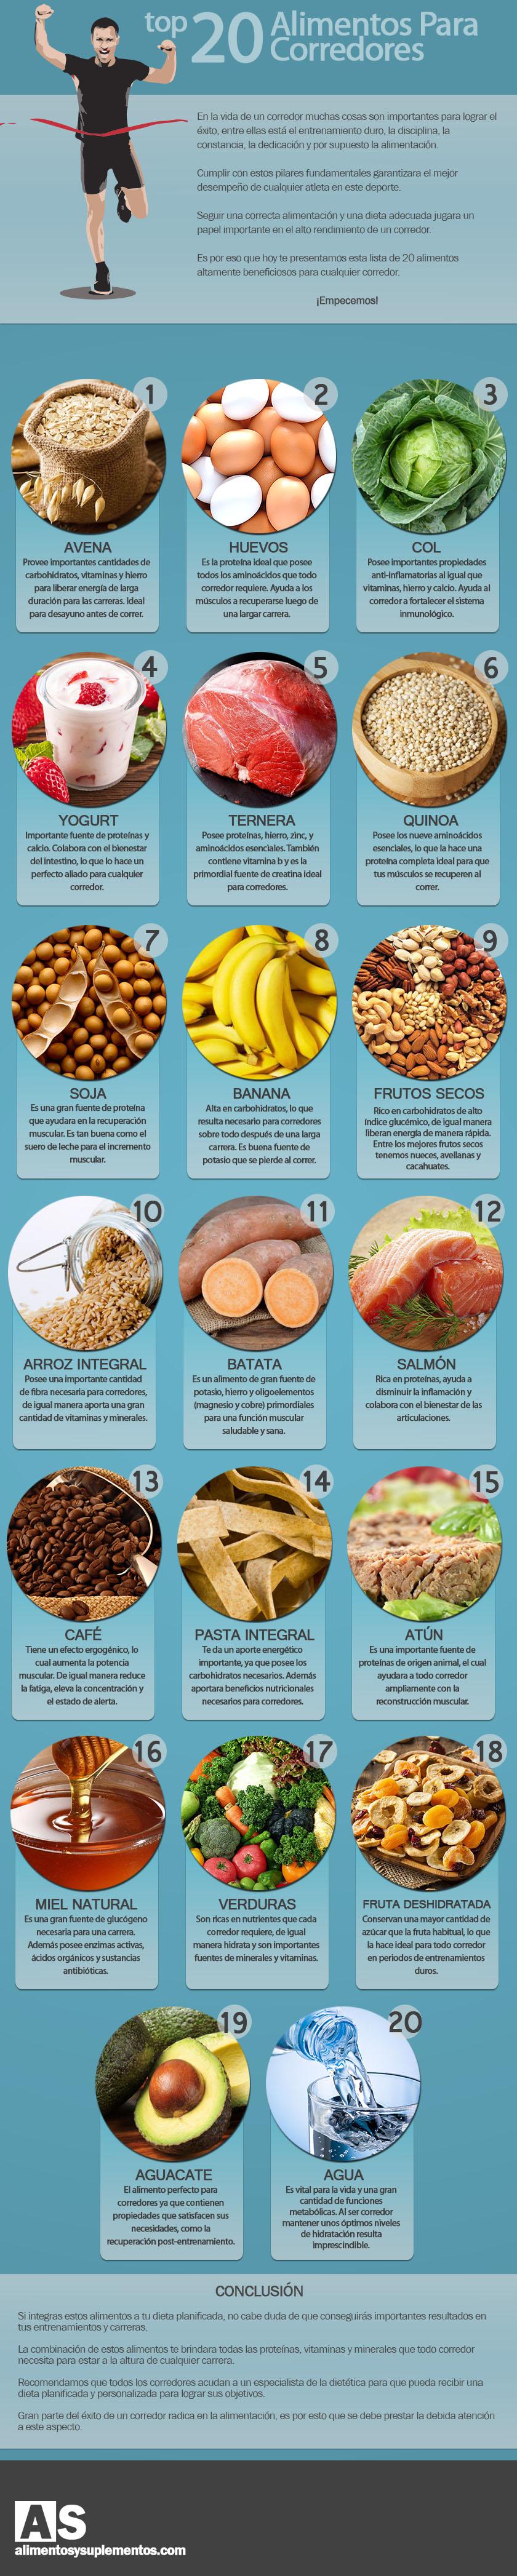 20 alimentos importantes para corredores infografia